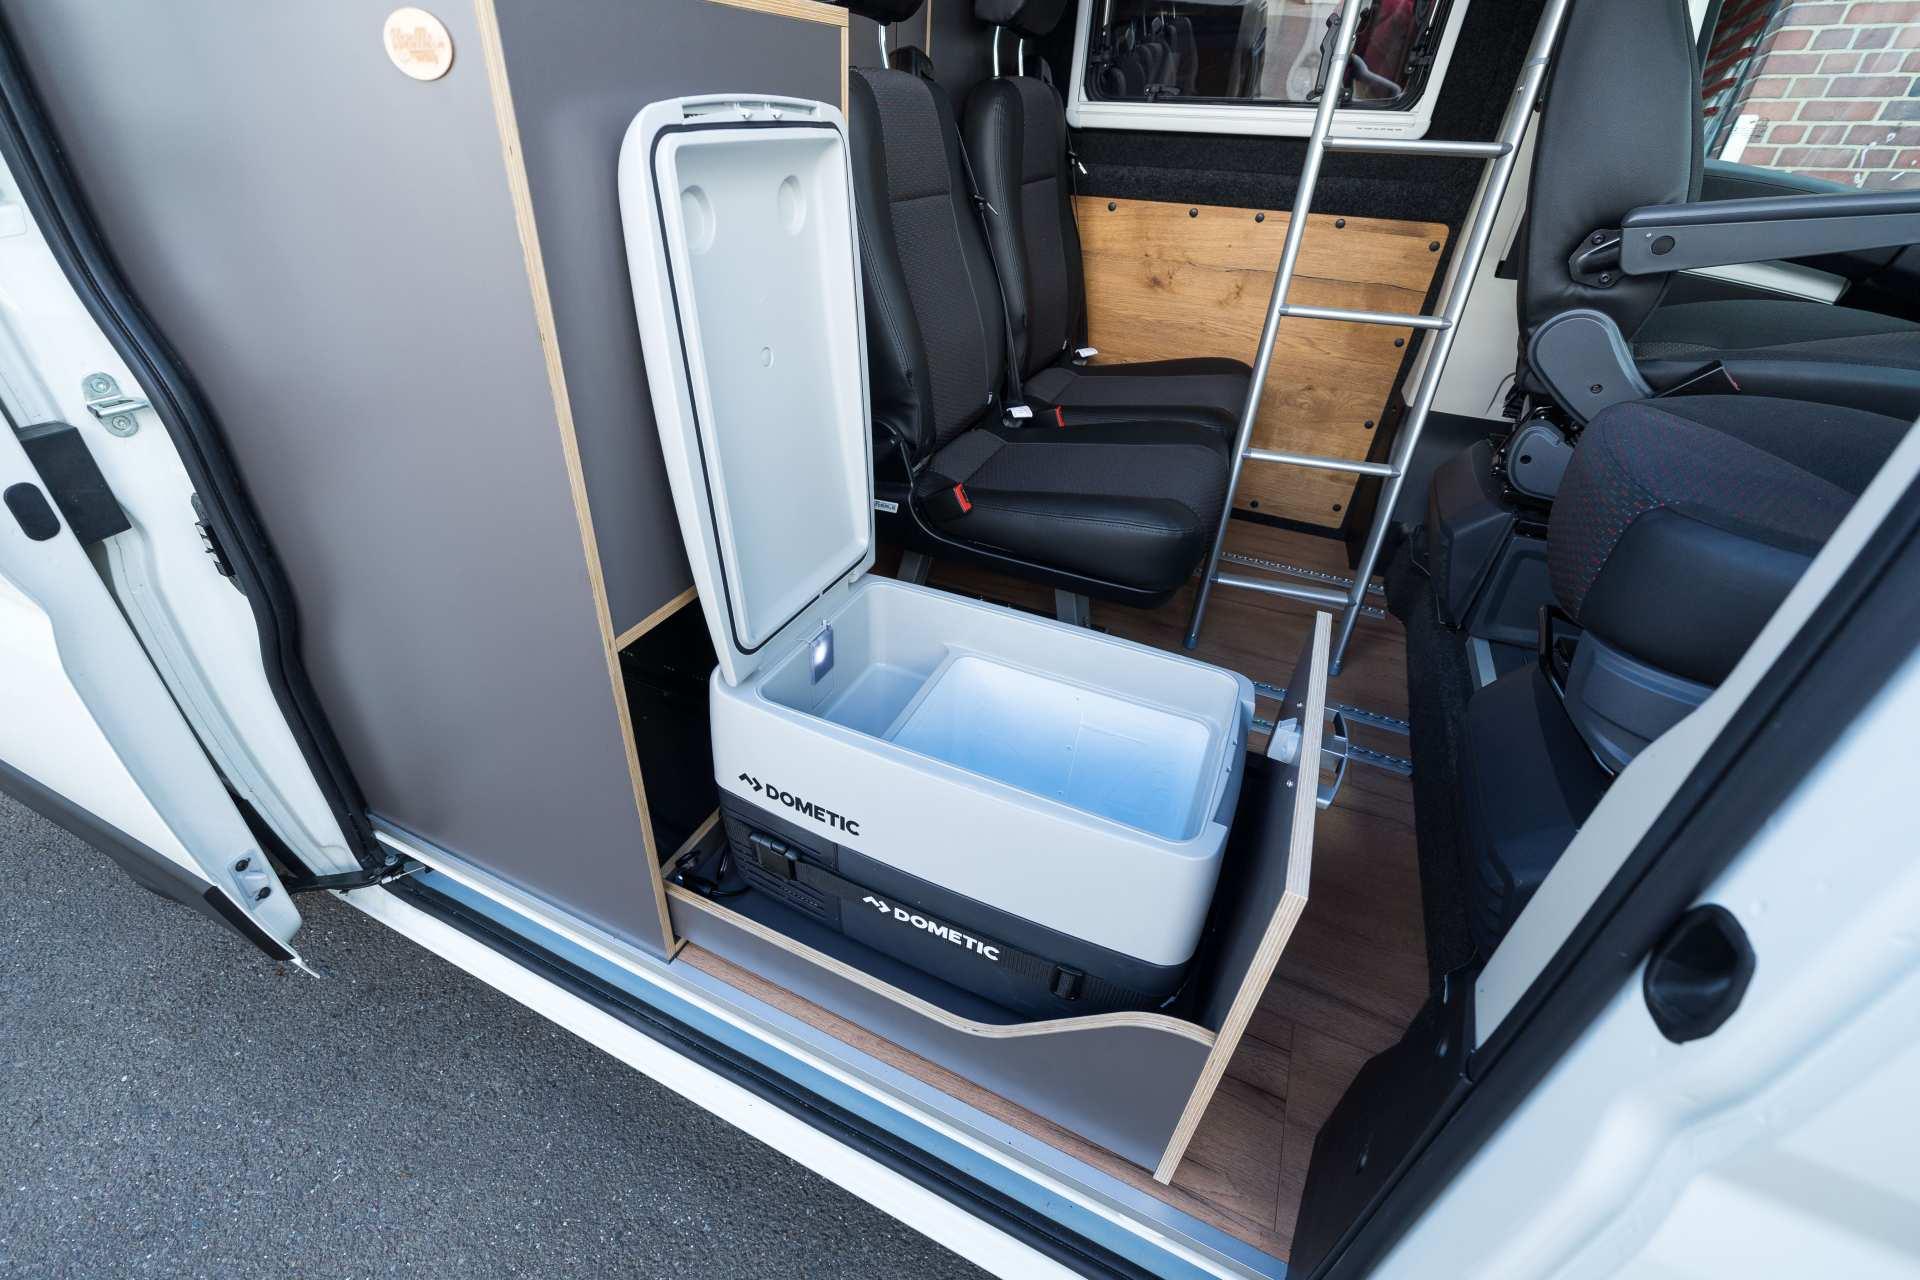 Individualausbau: Zwei-Raumwohnung Peugeot Boxer L2 H2 - 36